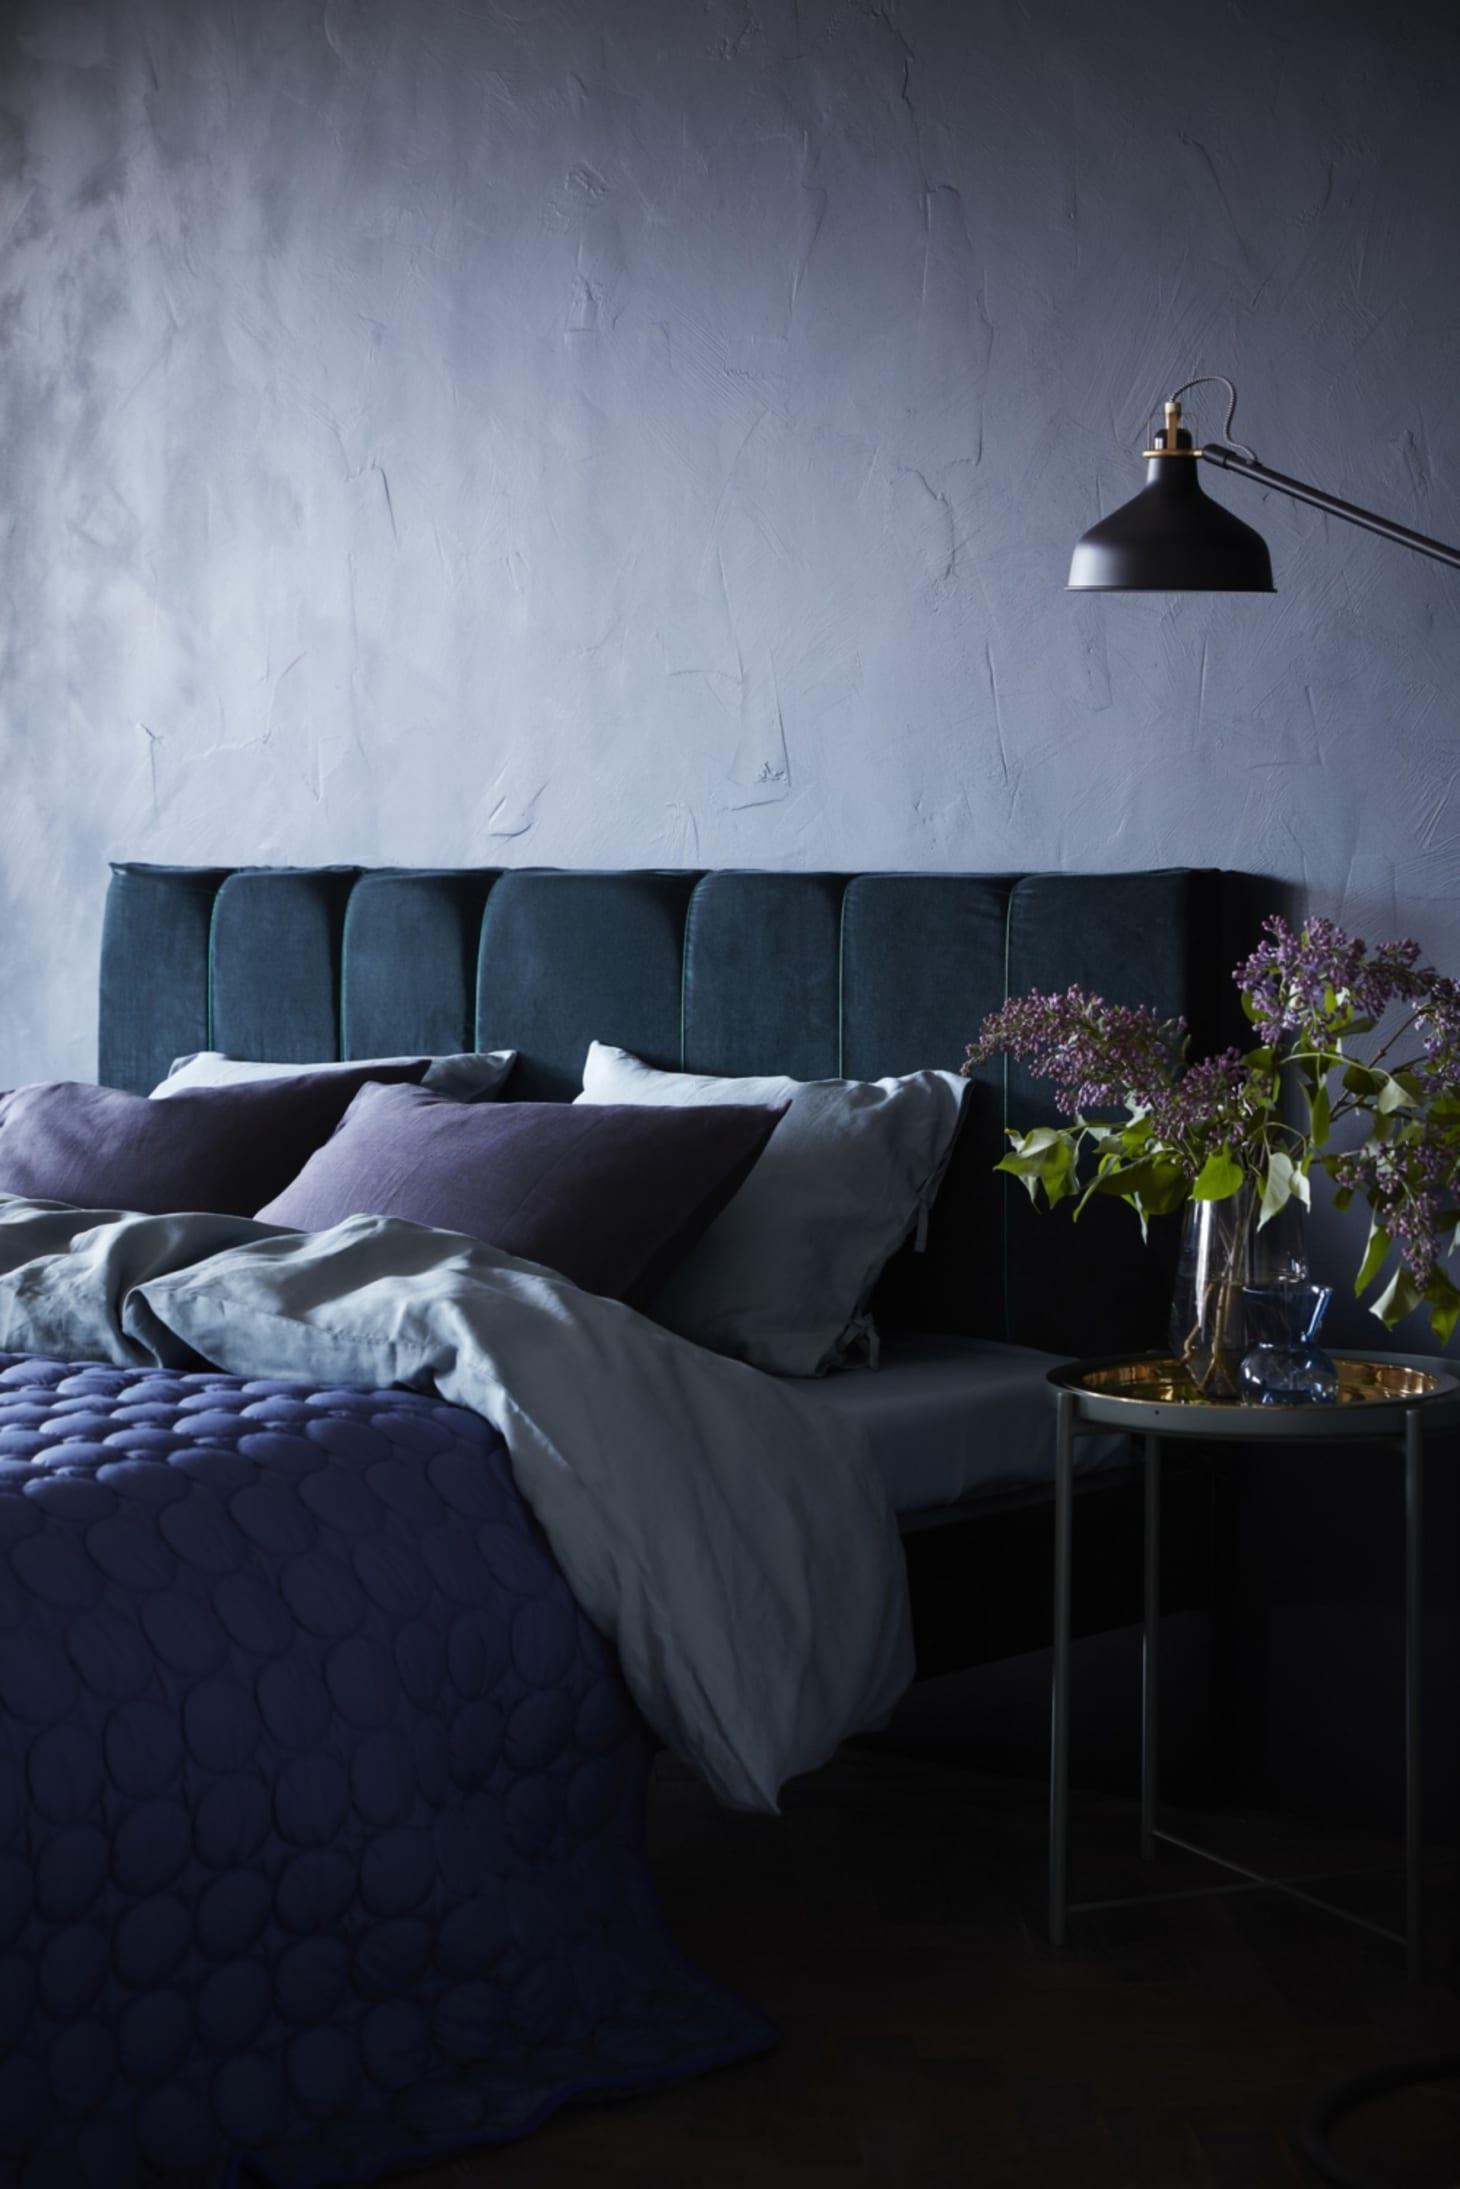 Ikea Bed Frame Hacks Diy Headboard Projects Apartment